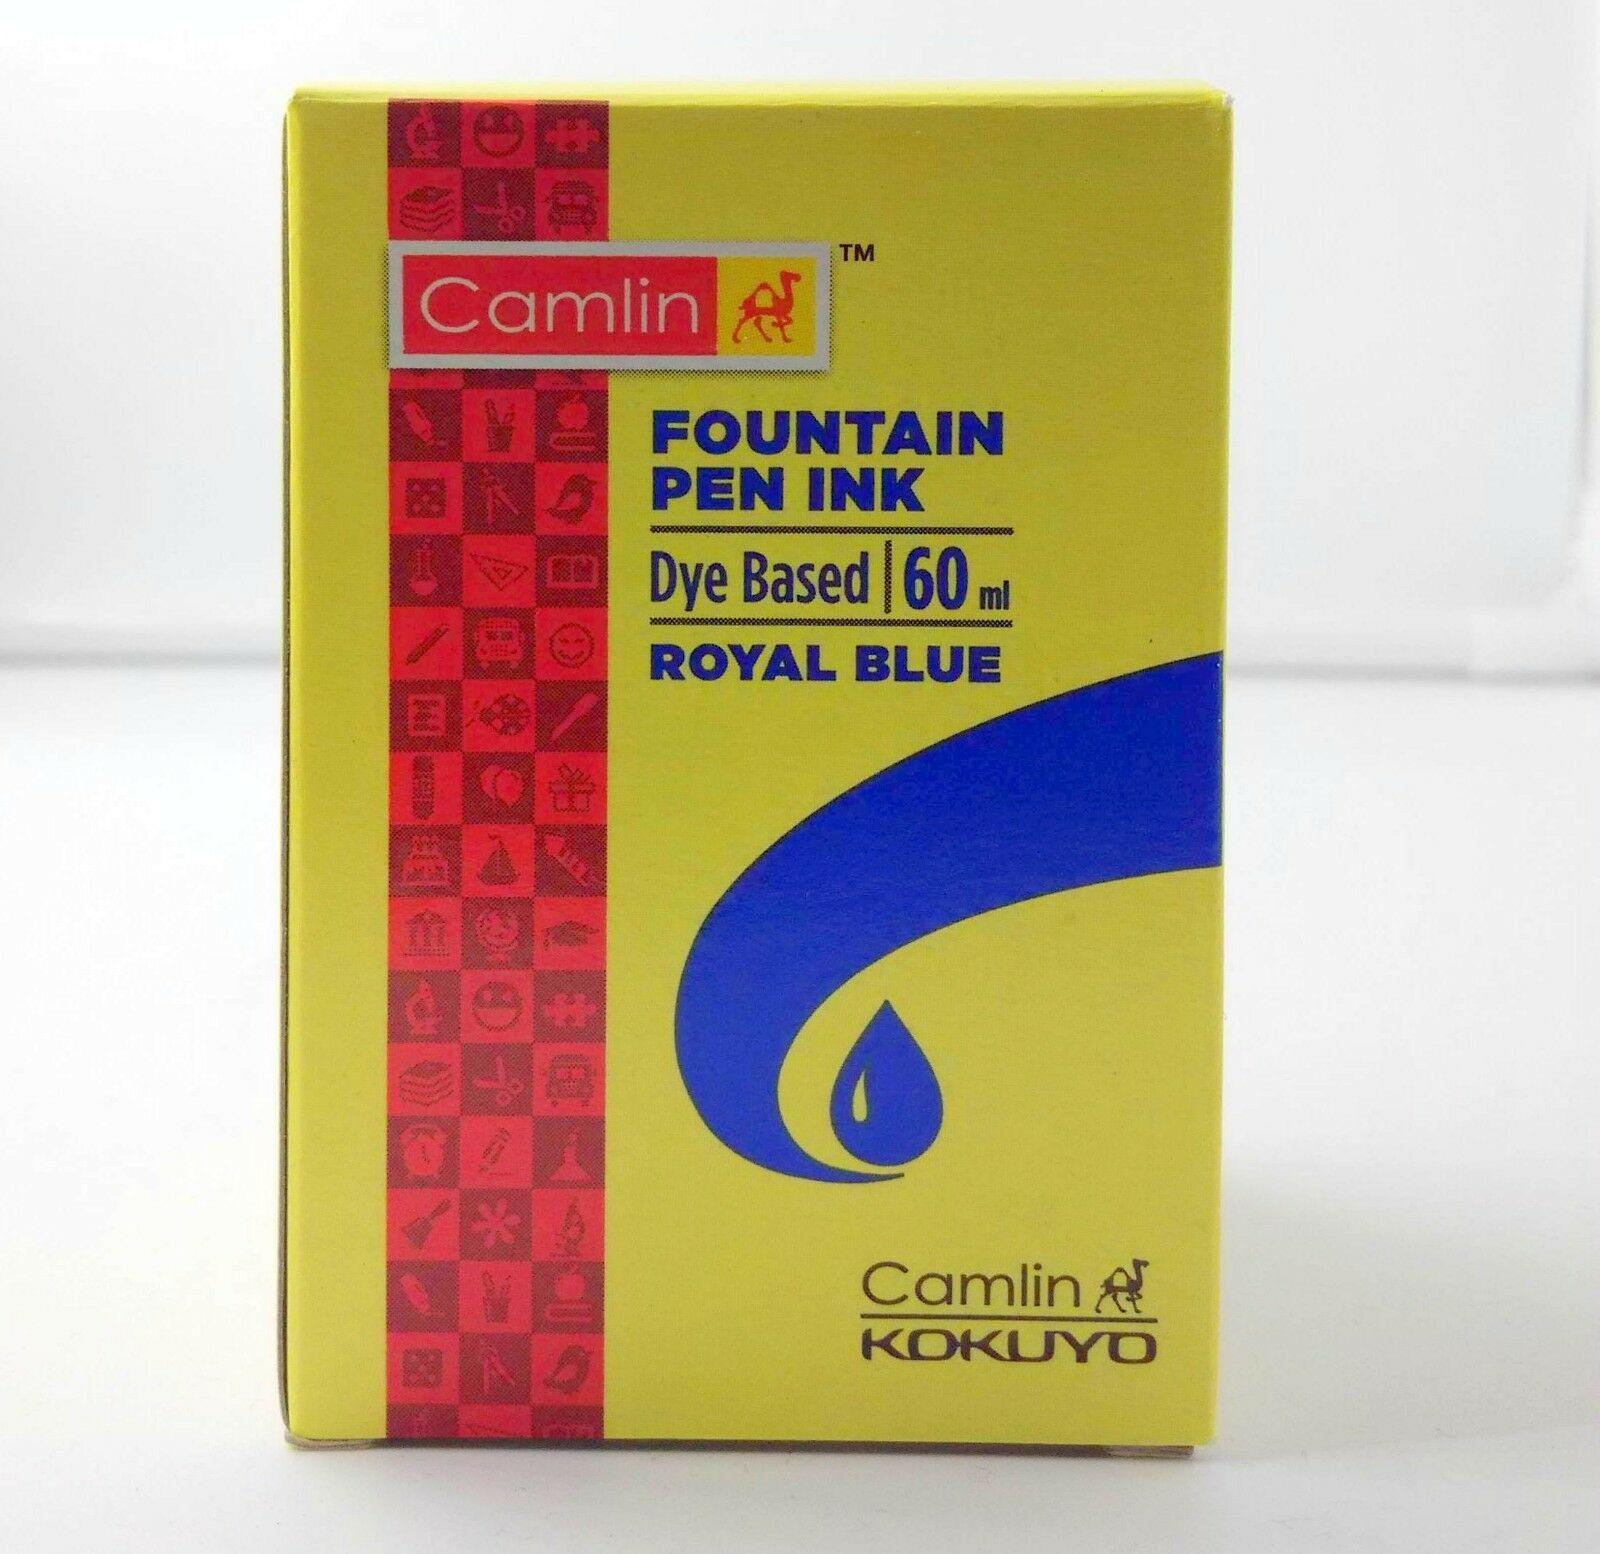 12 Camel Fountain Pen Ink ROYAL BLUE Bottles 60 ml 2oz Camlin 12 qty New Sealed